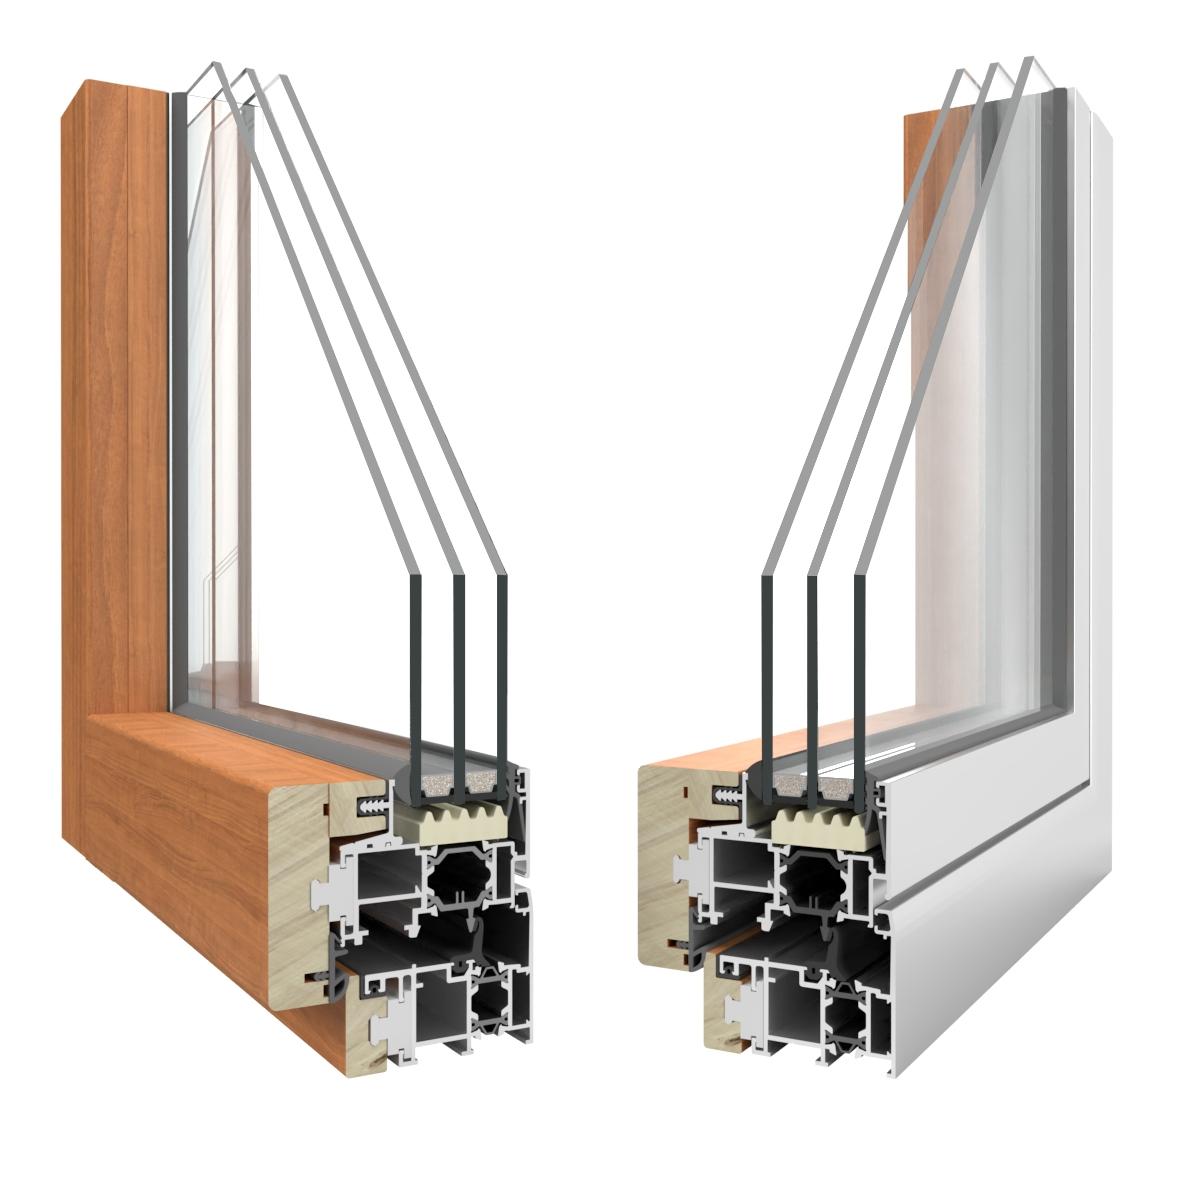 https://www.allpaint.it/wp-content/uploads/2021/07/finestre-alluminio-legno-tkwood-small-allpaint.jpg